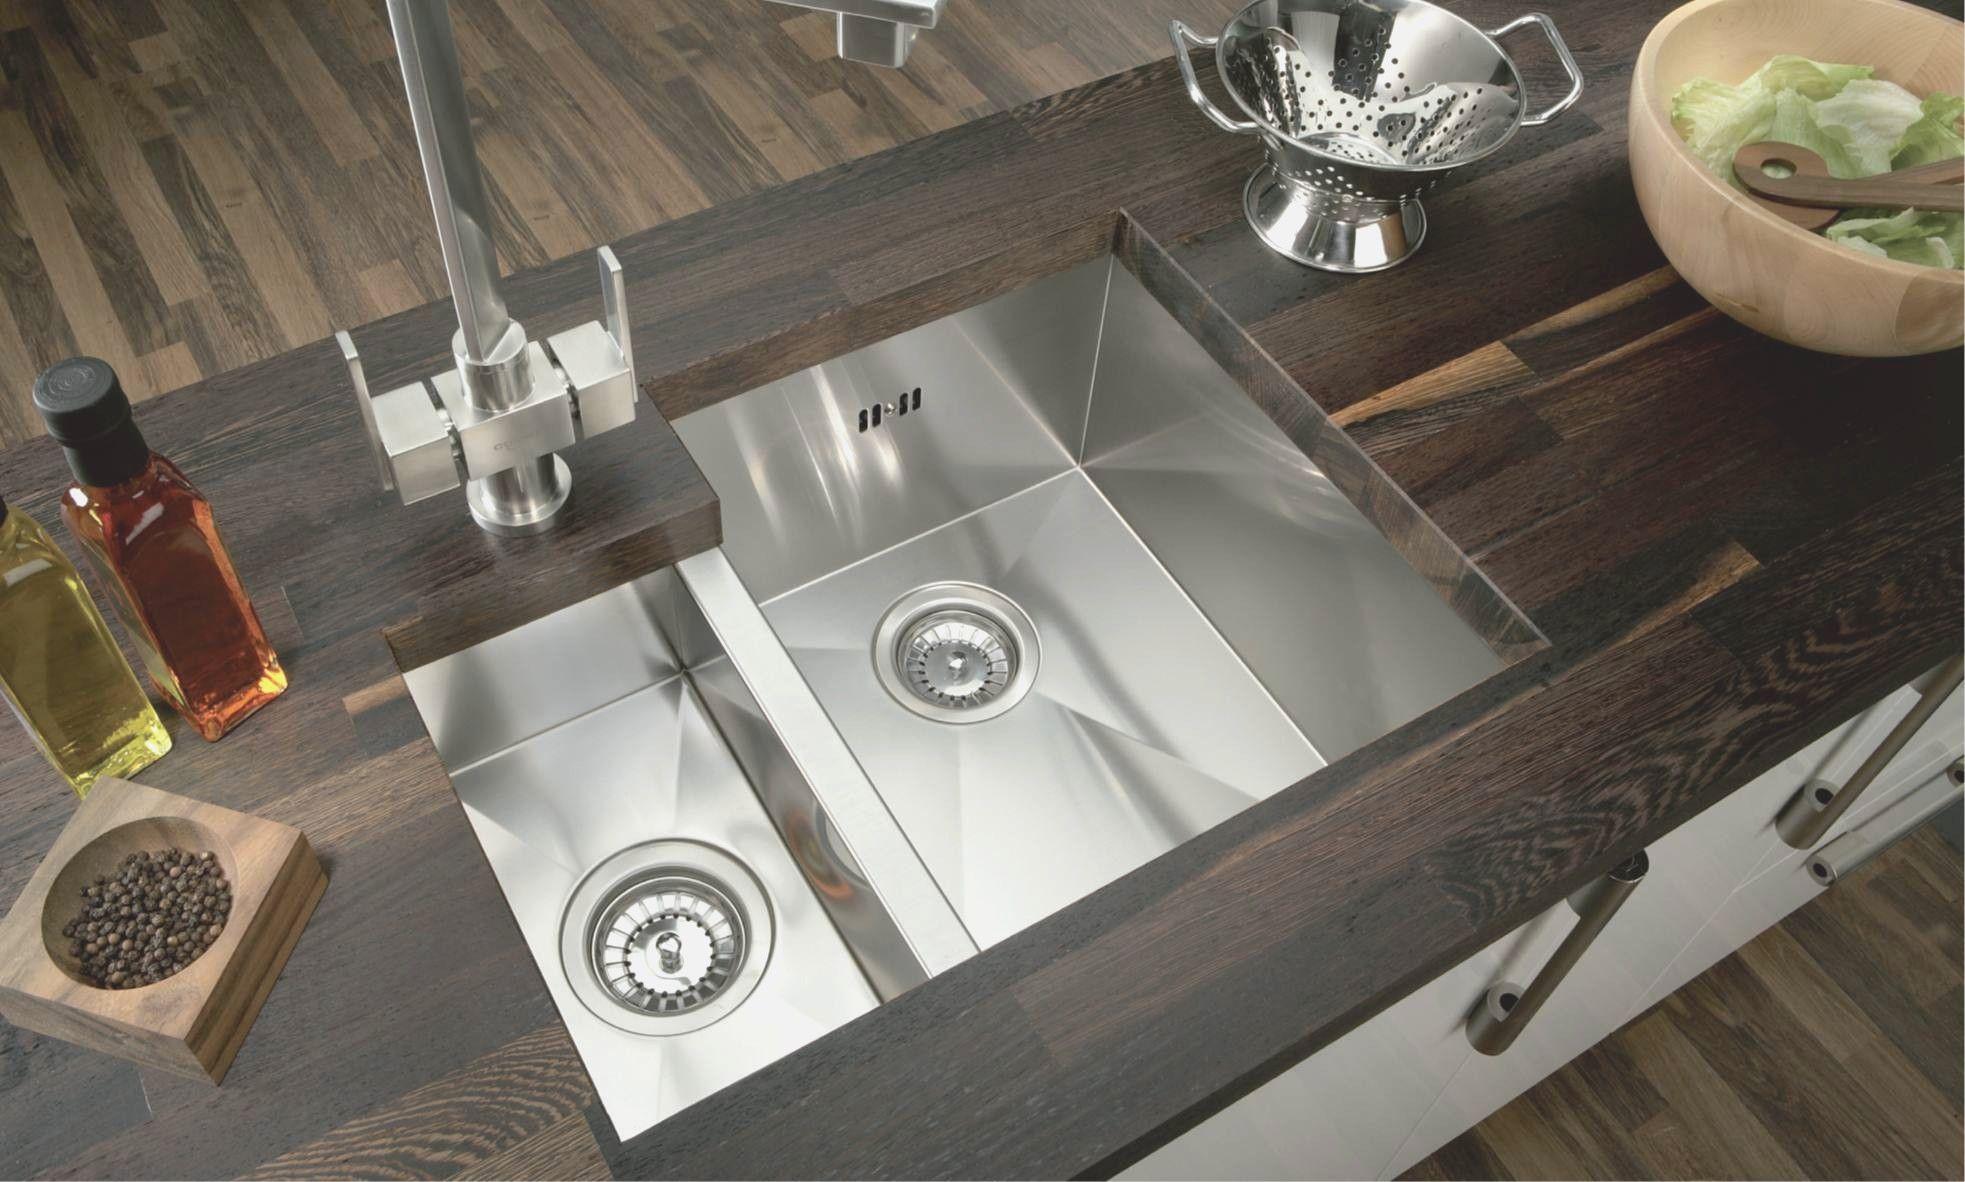 Stainless Steel Undermount Kitchen Sinks - 25 inch stainless steel ...